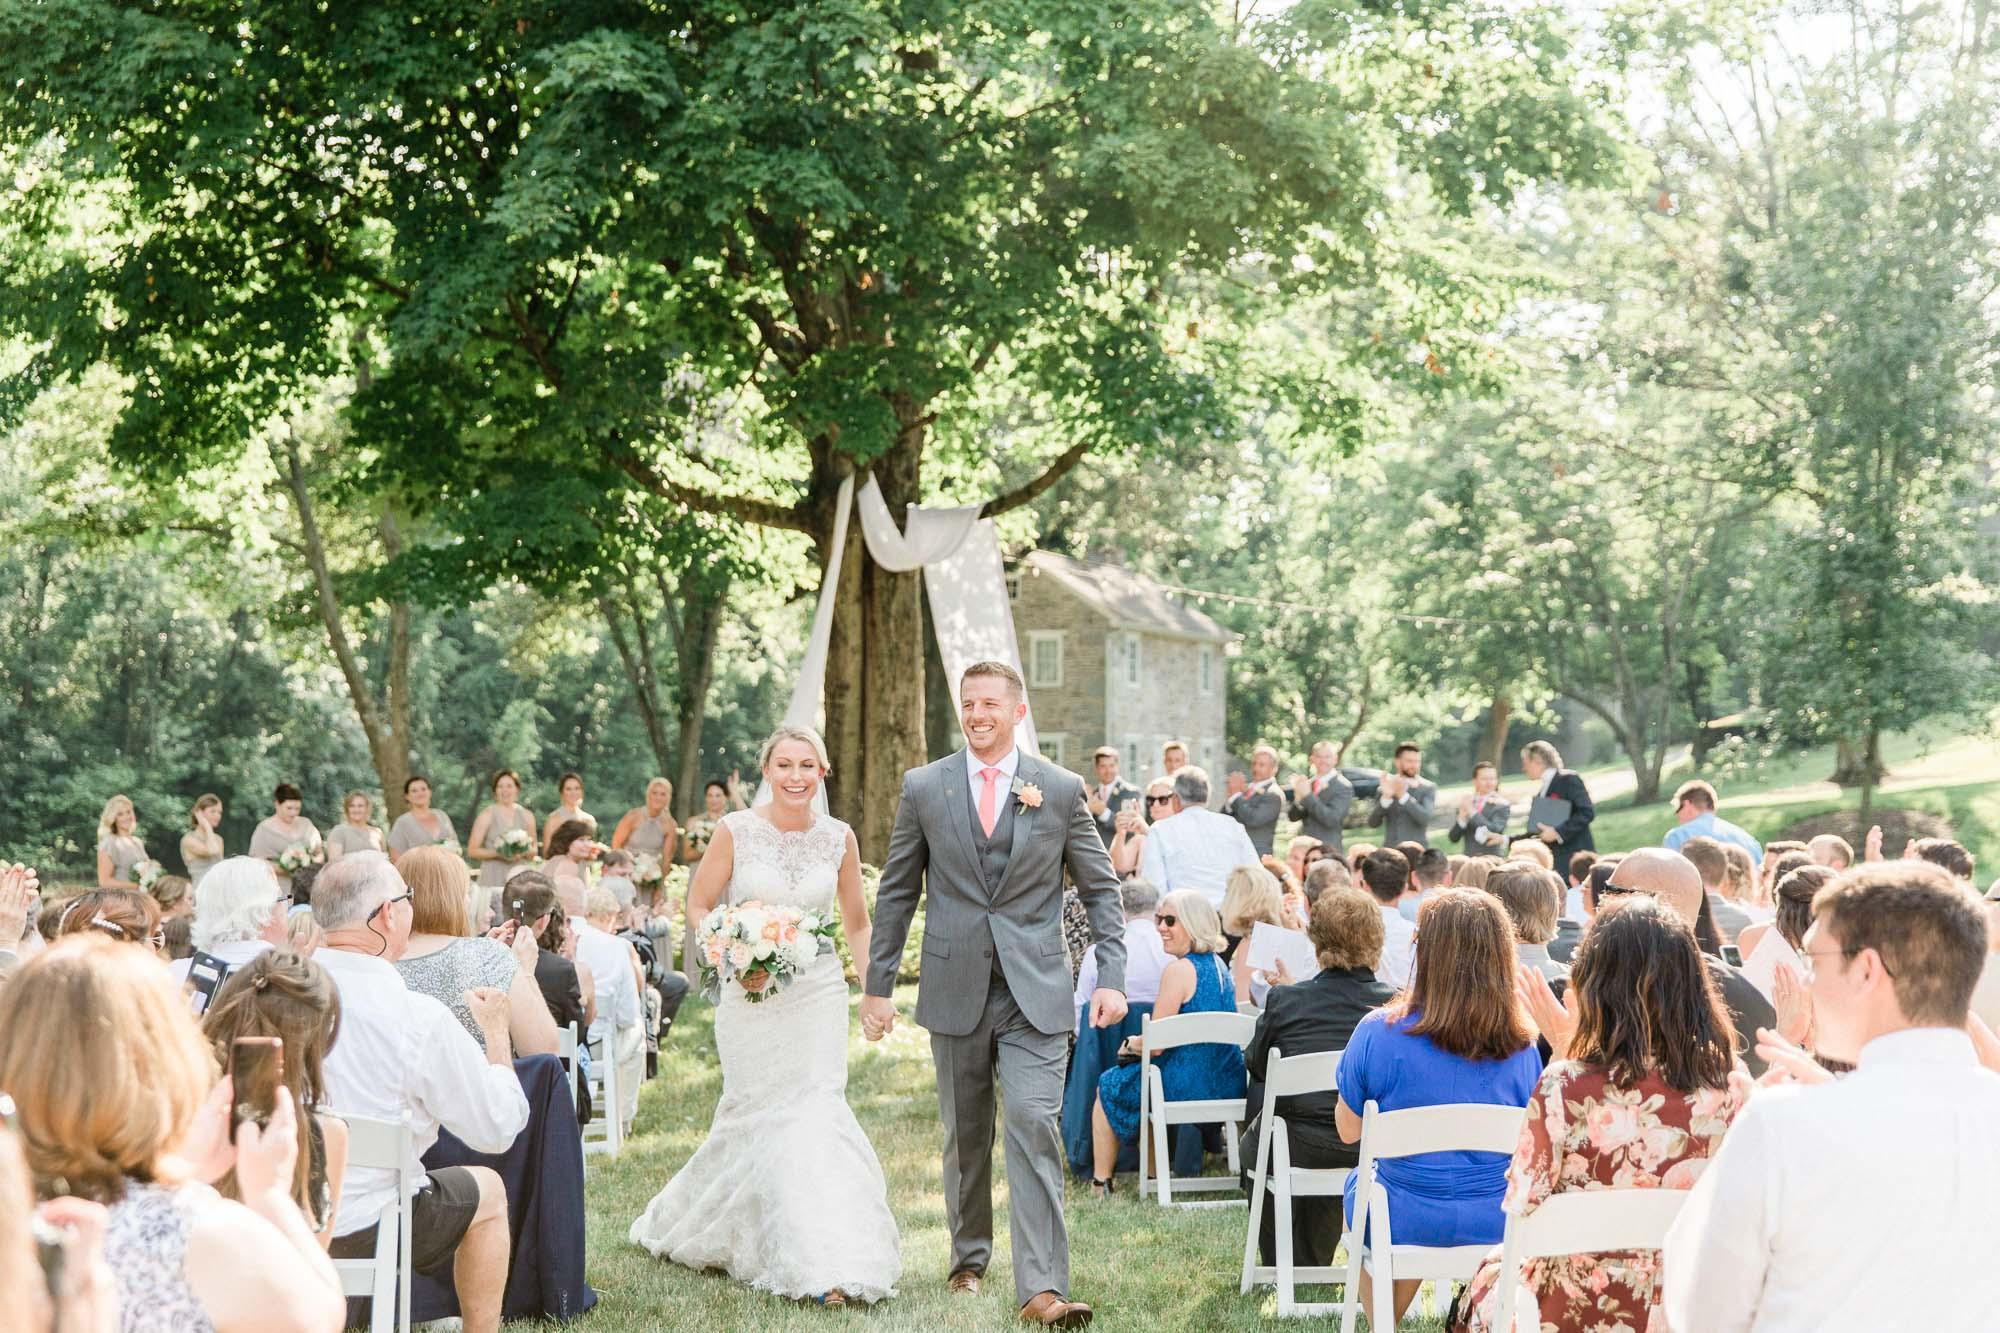 Allenberry-resort-historic-pennsylvania-wedding-19942.jpg